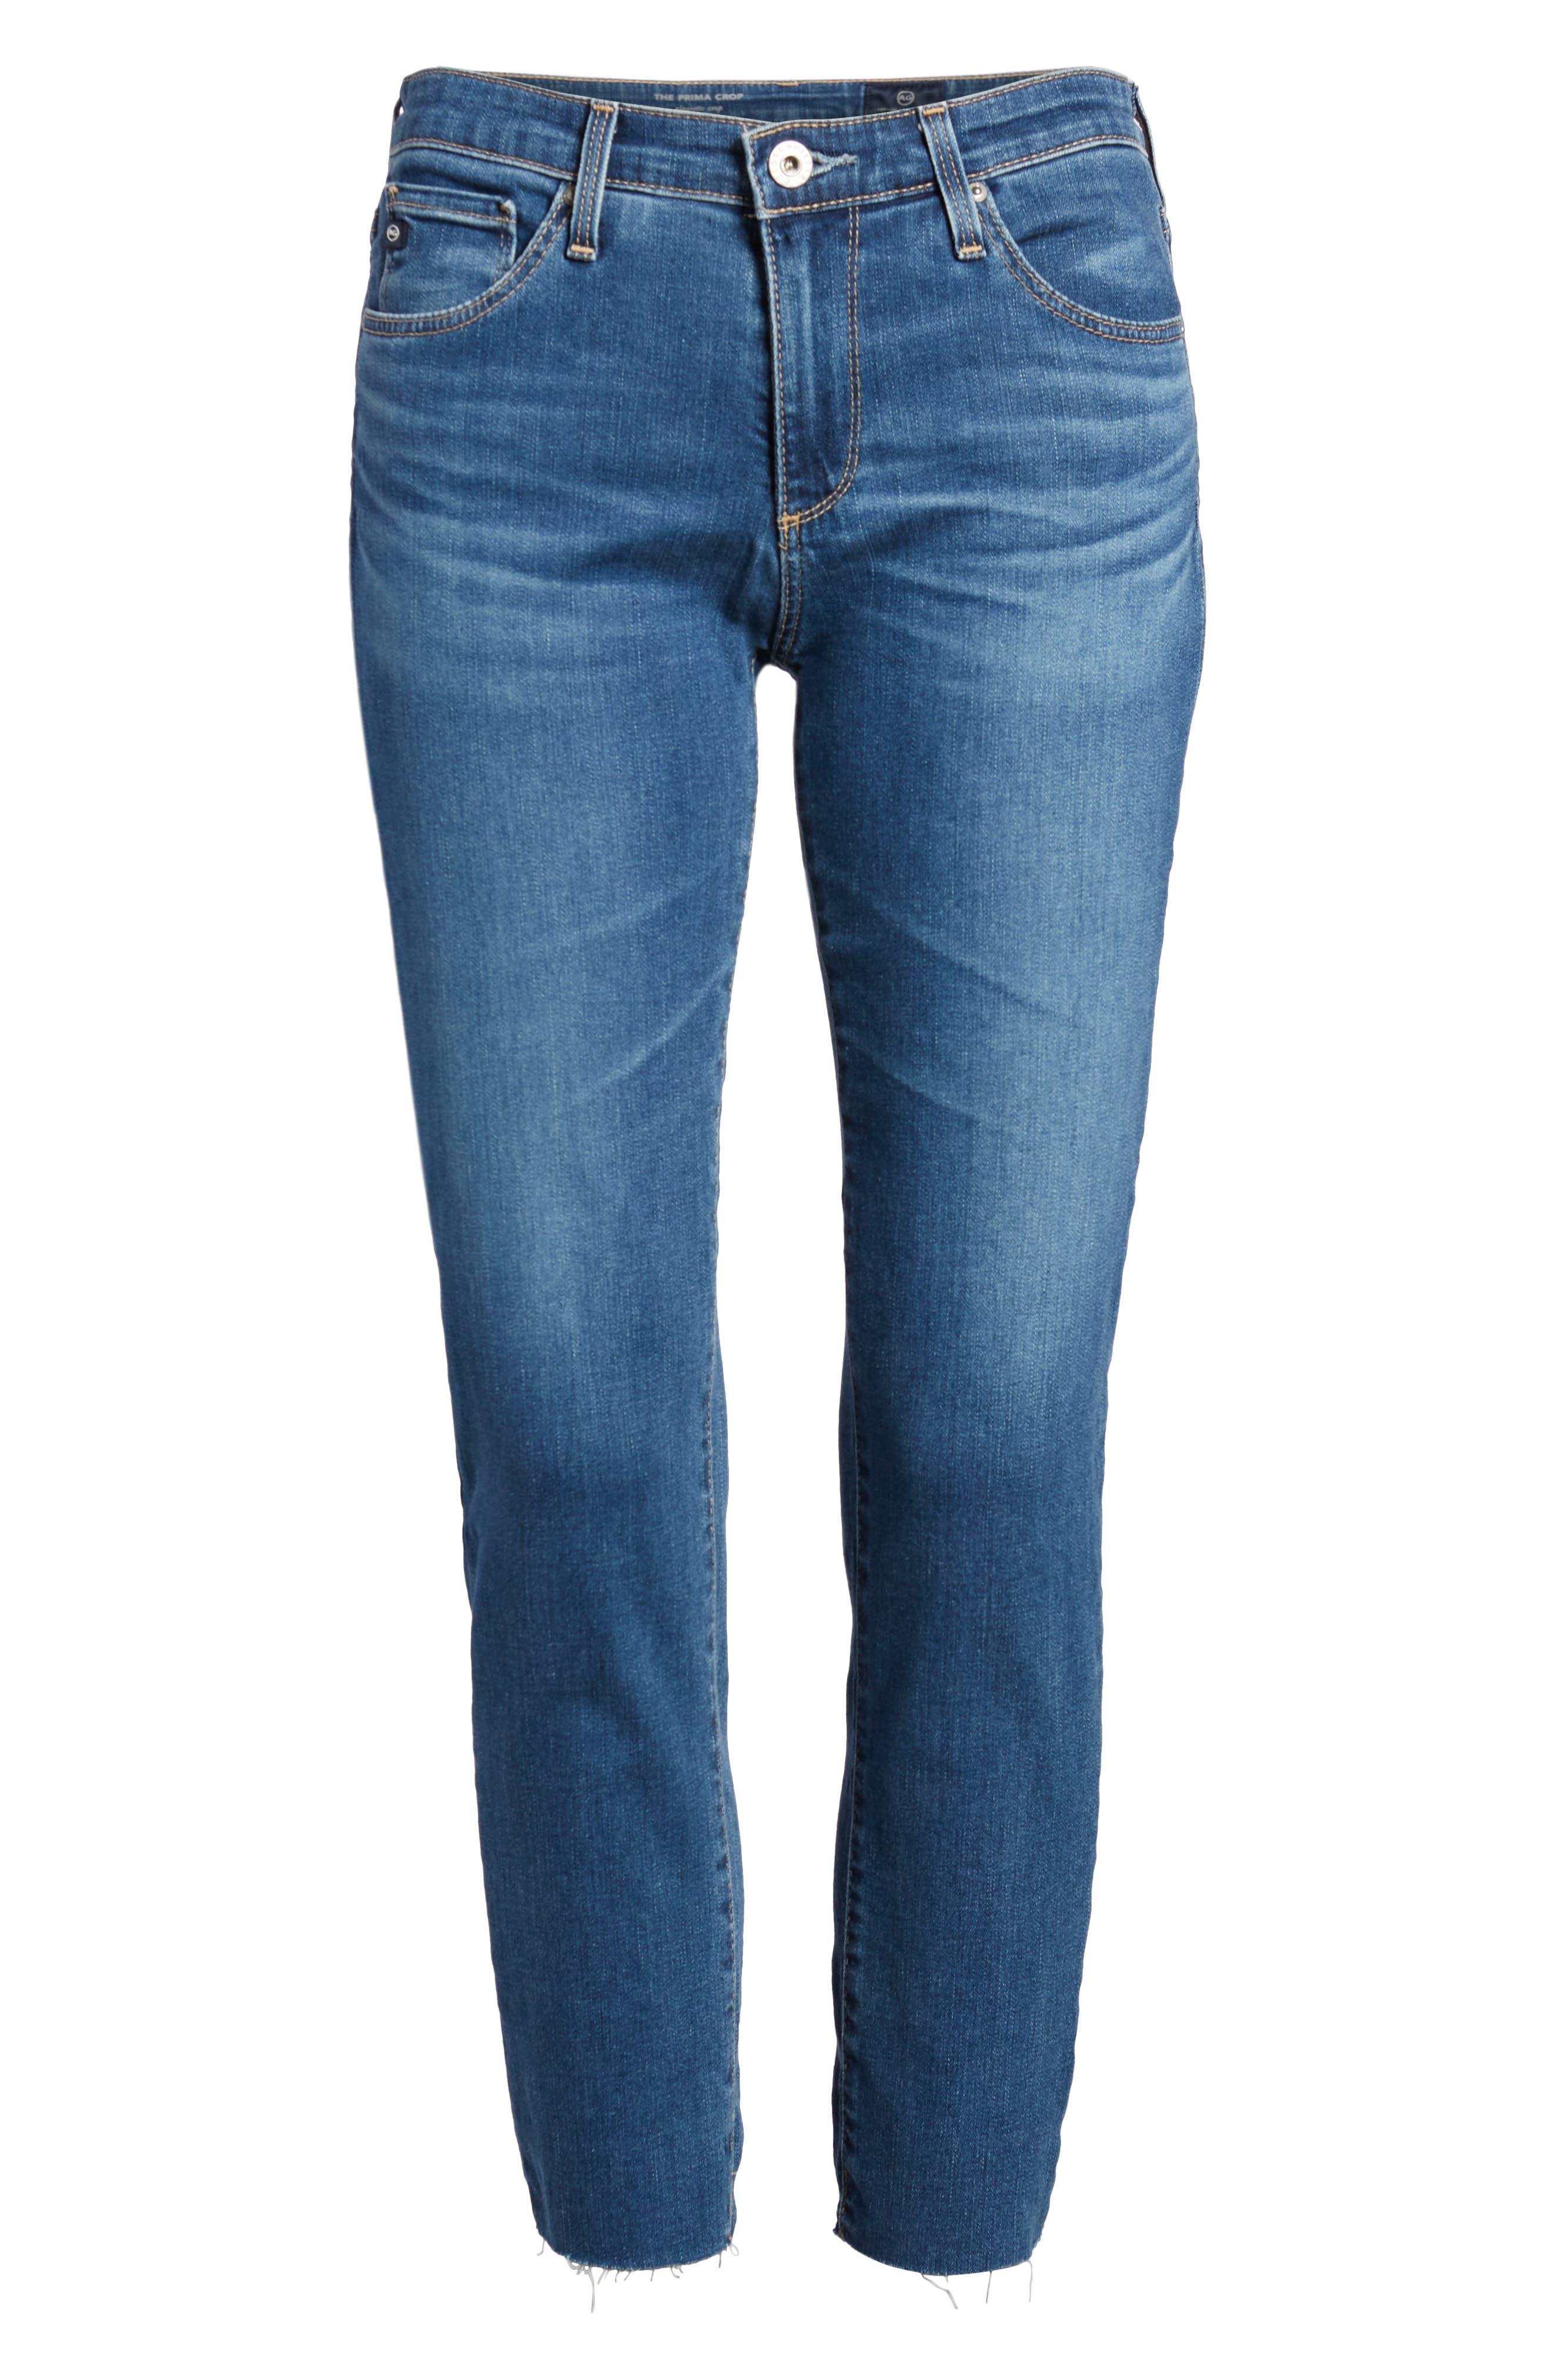 Prima Crop Skinny Jeans,                             Alternate thumbnail 6, color,                             416